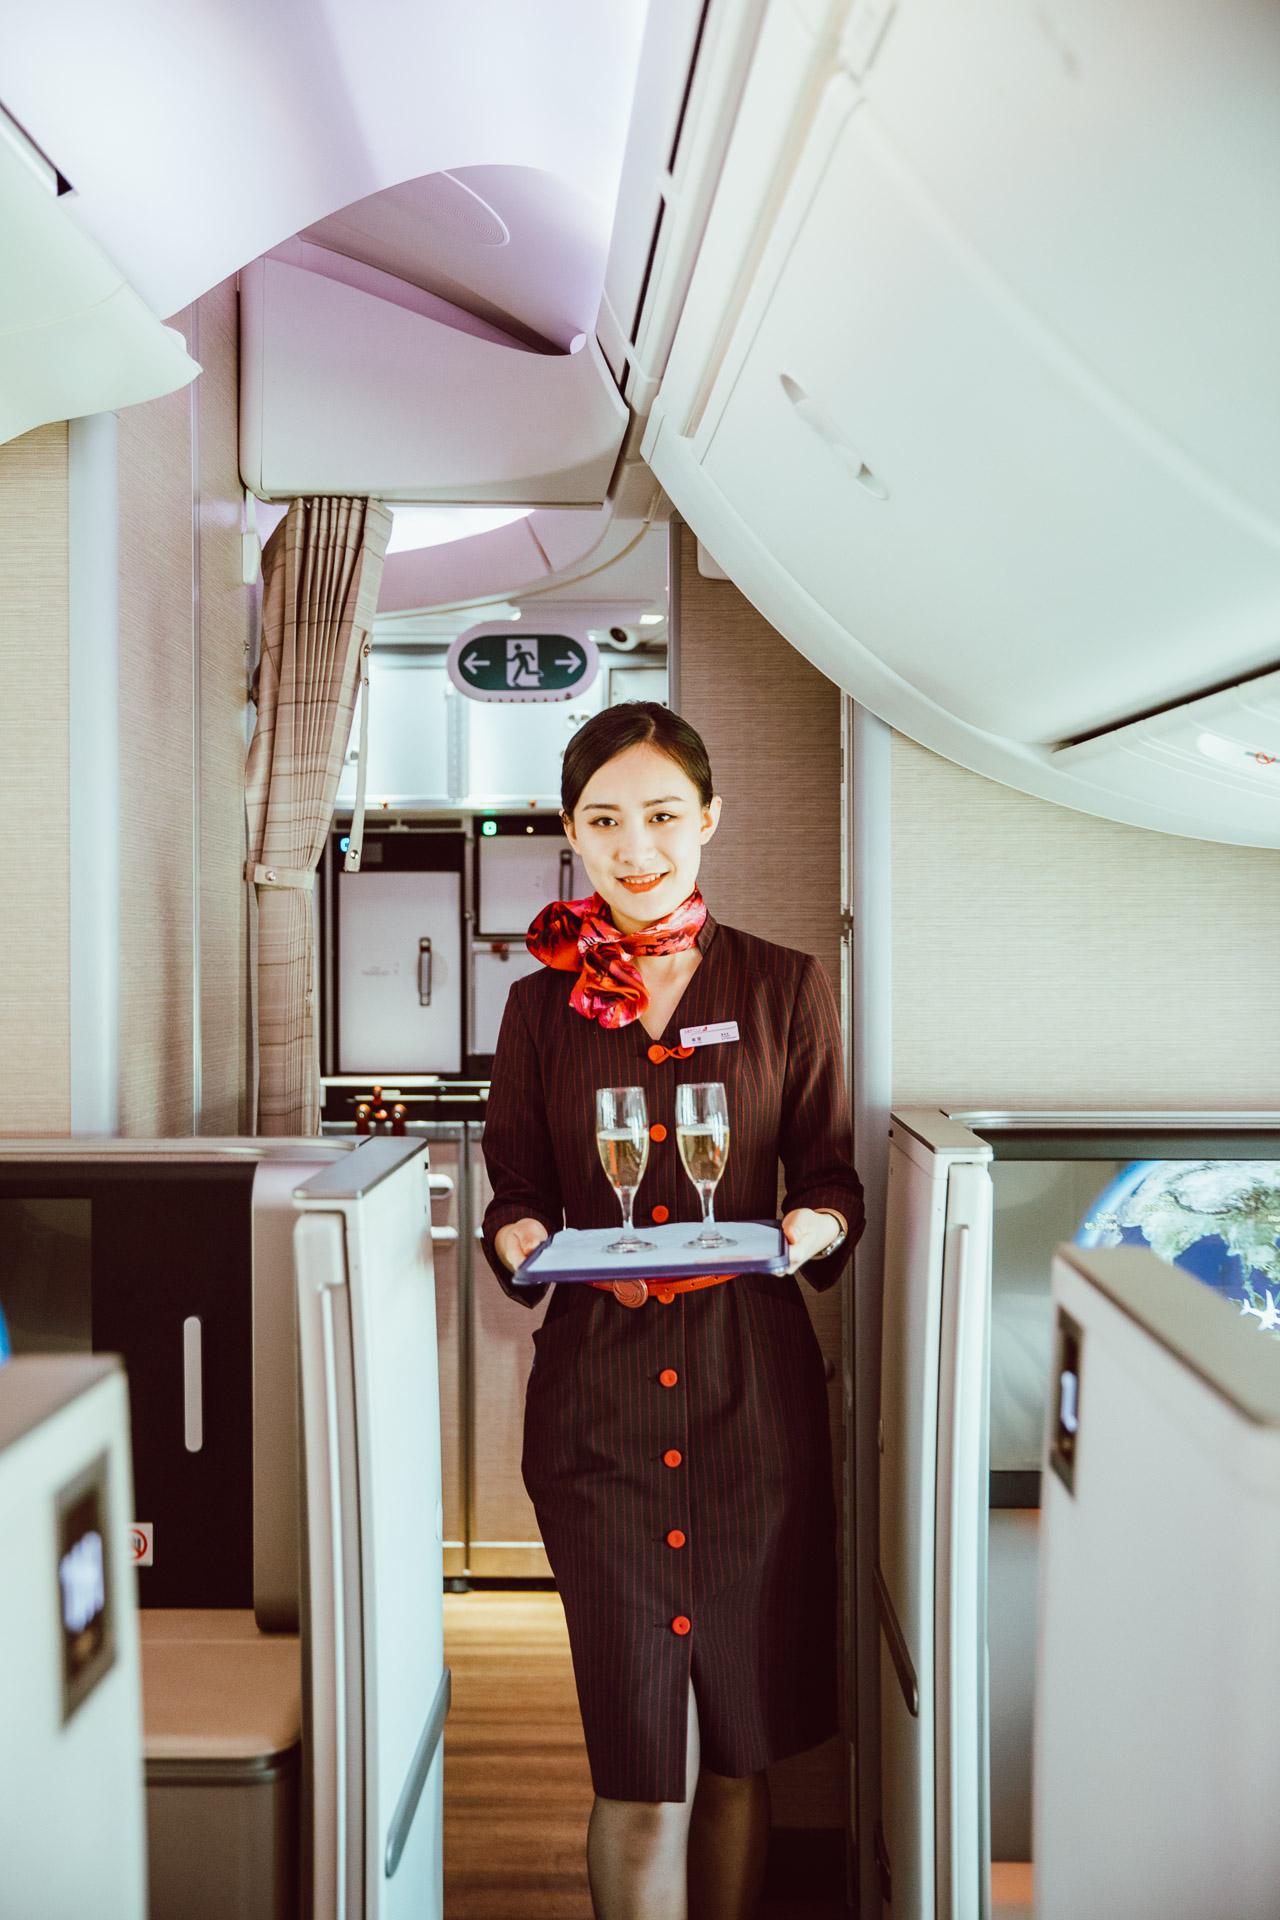 aviation-photographer-lifestyle-china-eastern-singapore-destination-4066.jpg